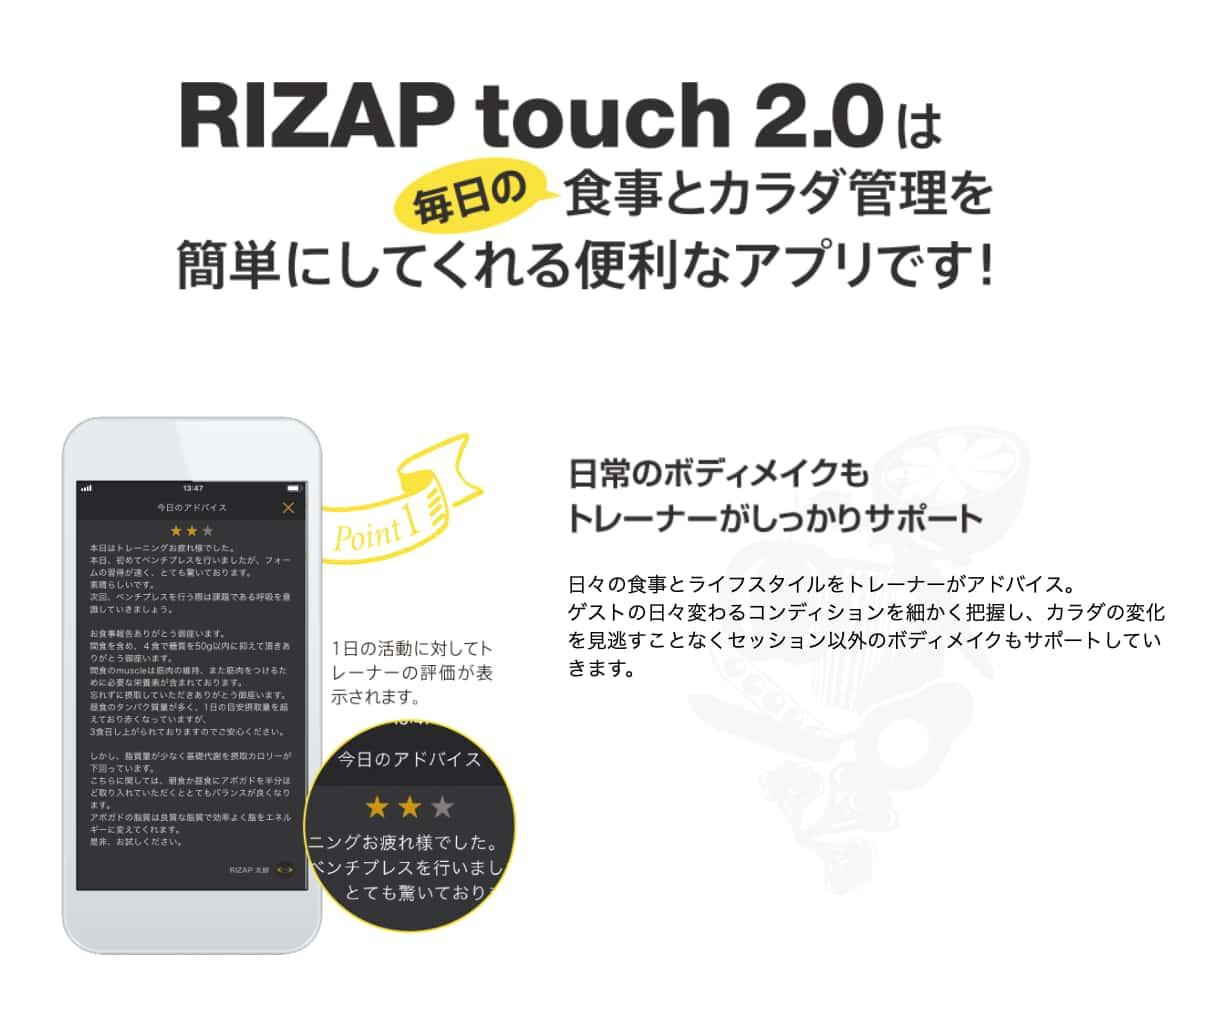 rizap不安3